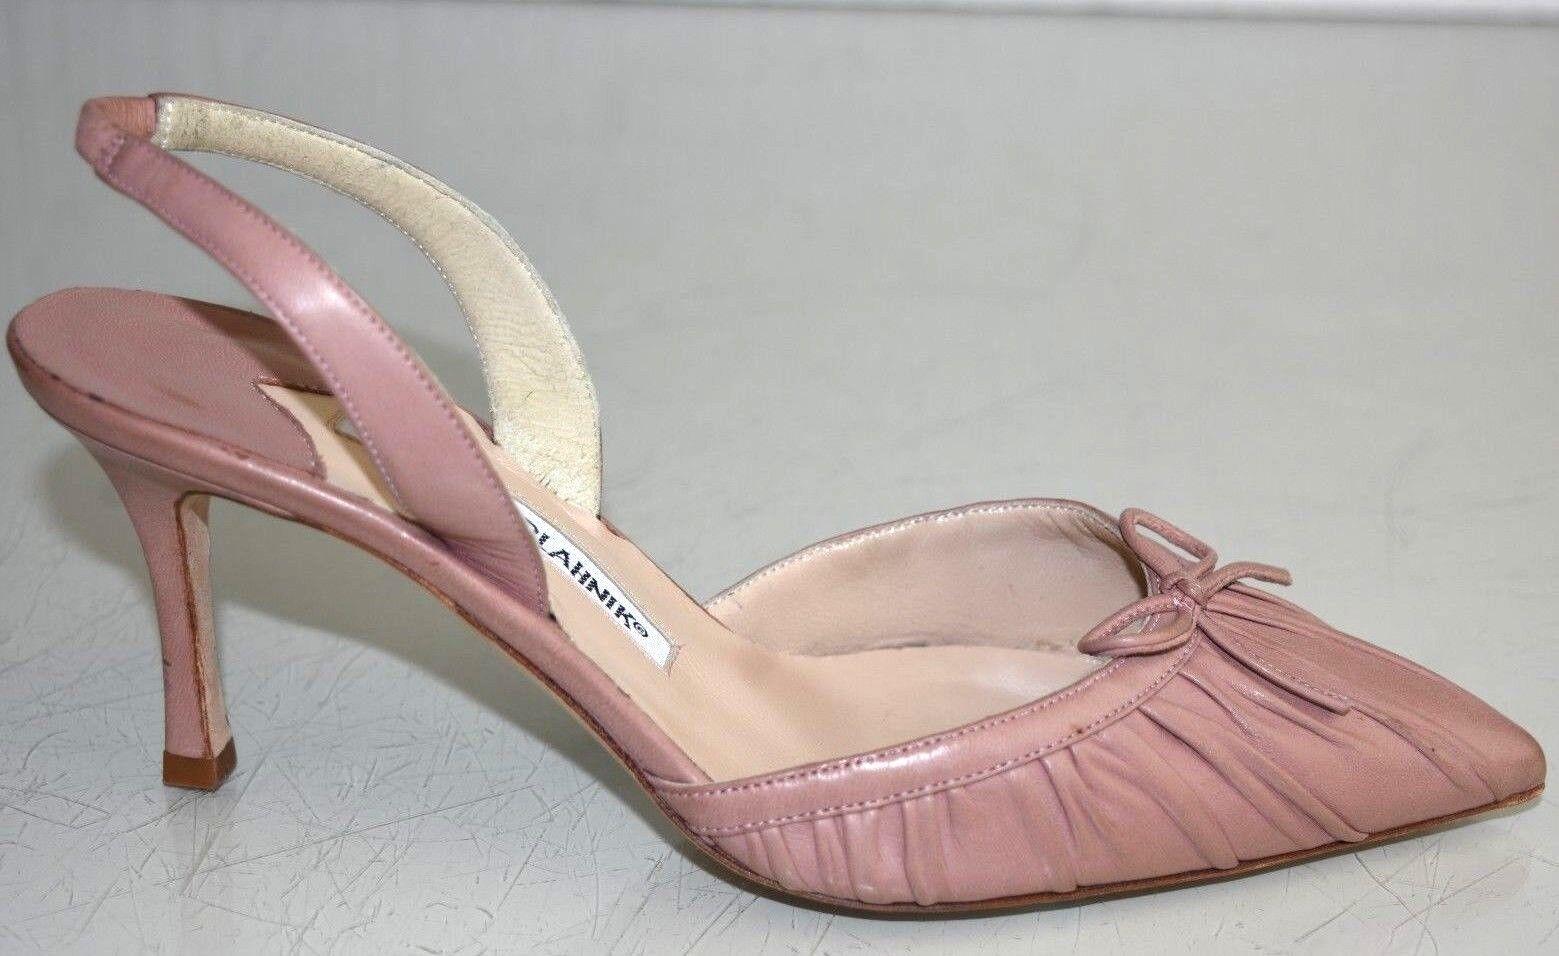 New Manolo Blahnik RAGANGISLI 70 Carolyne Pump Leather Halter pink Nude shoes 37